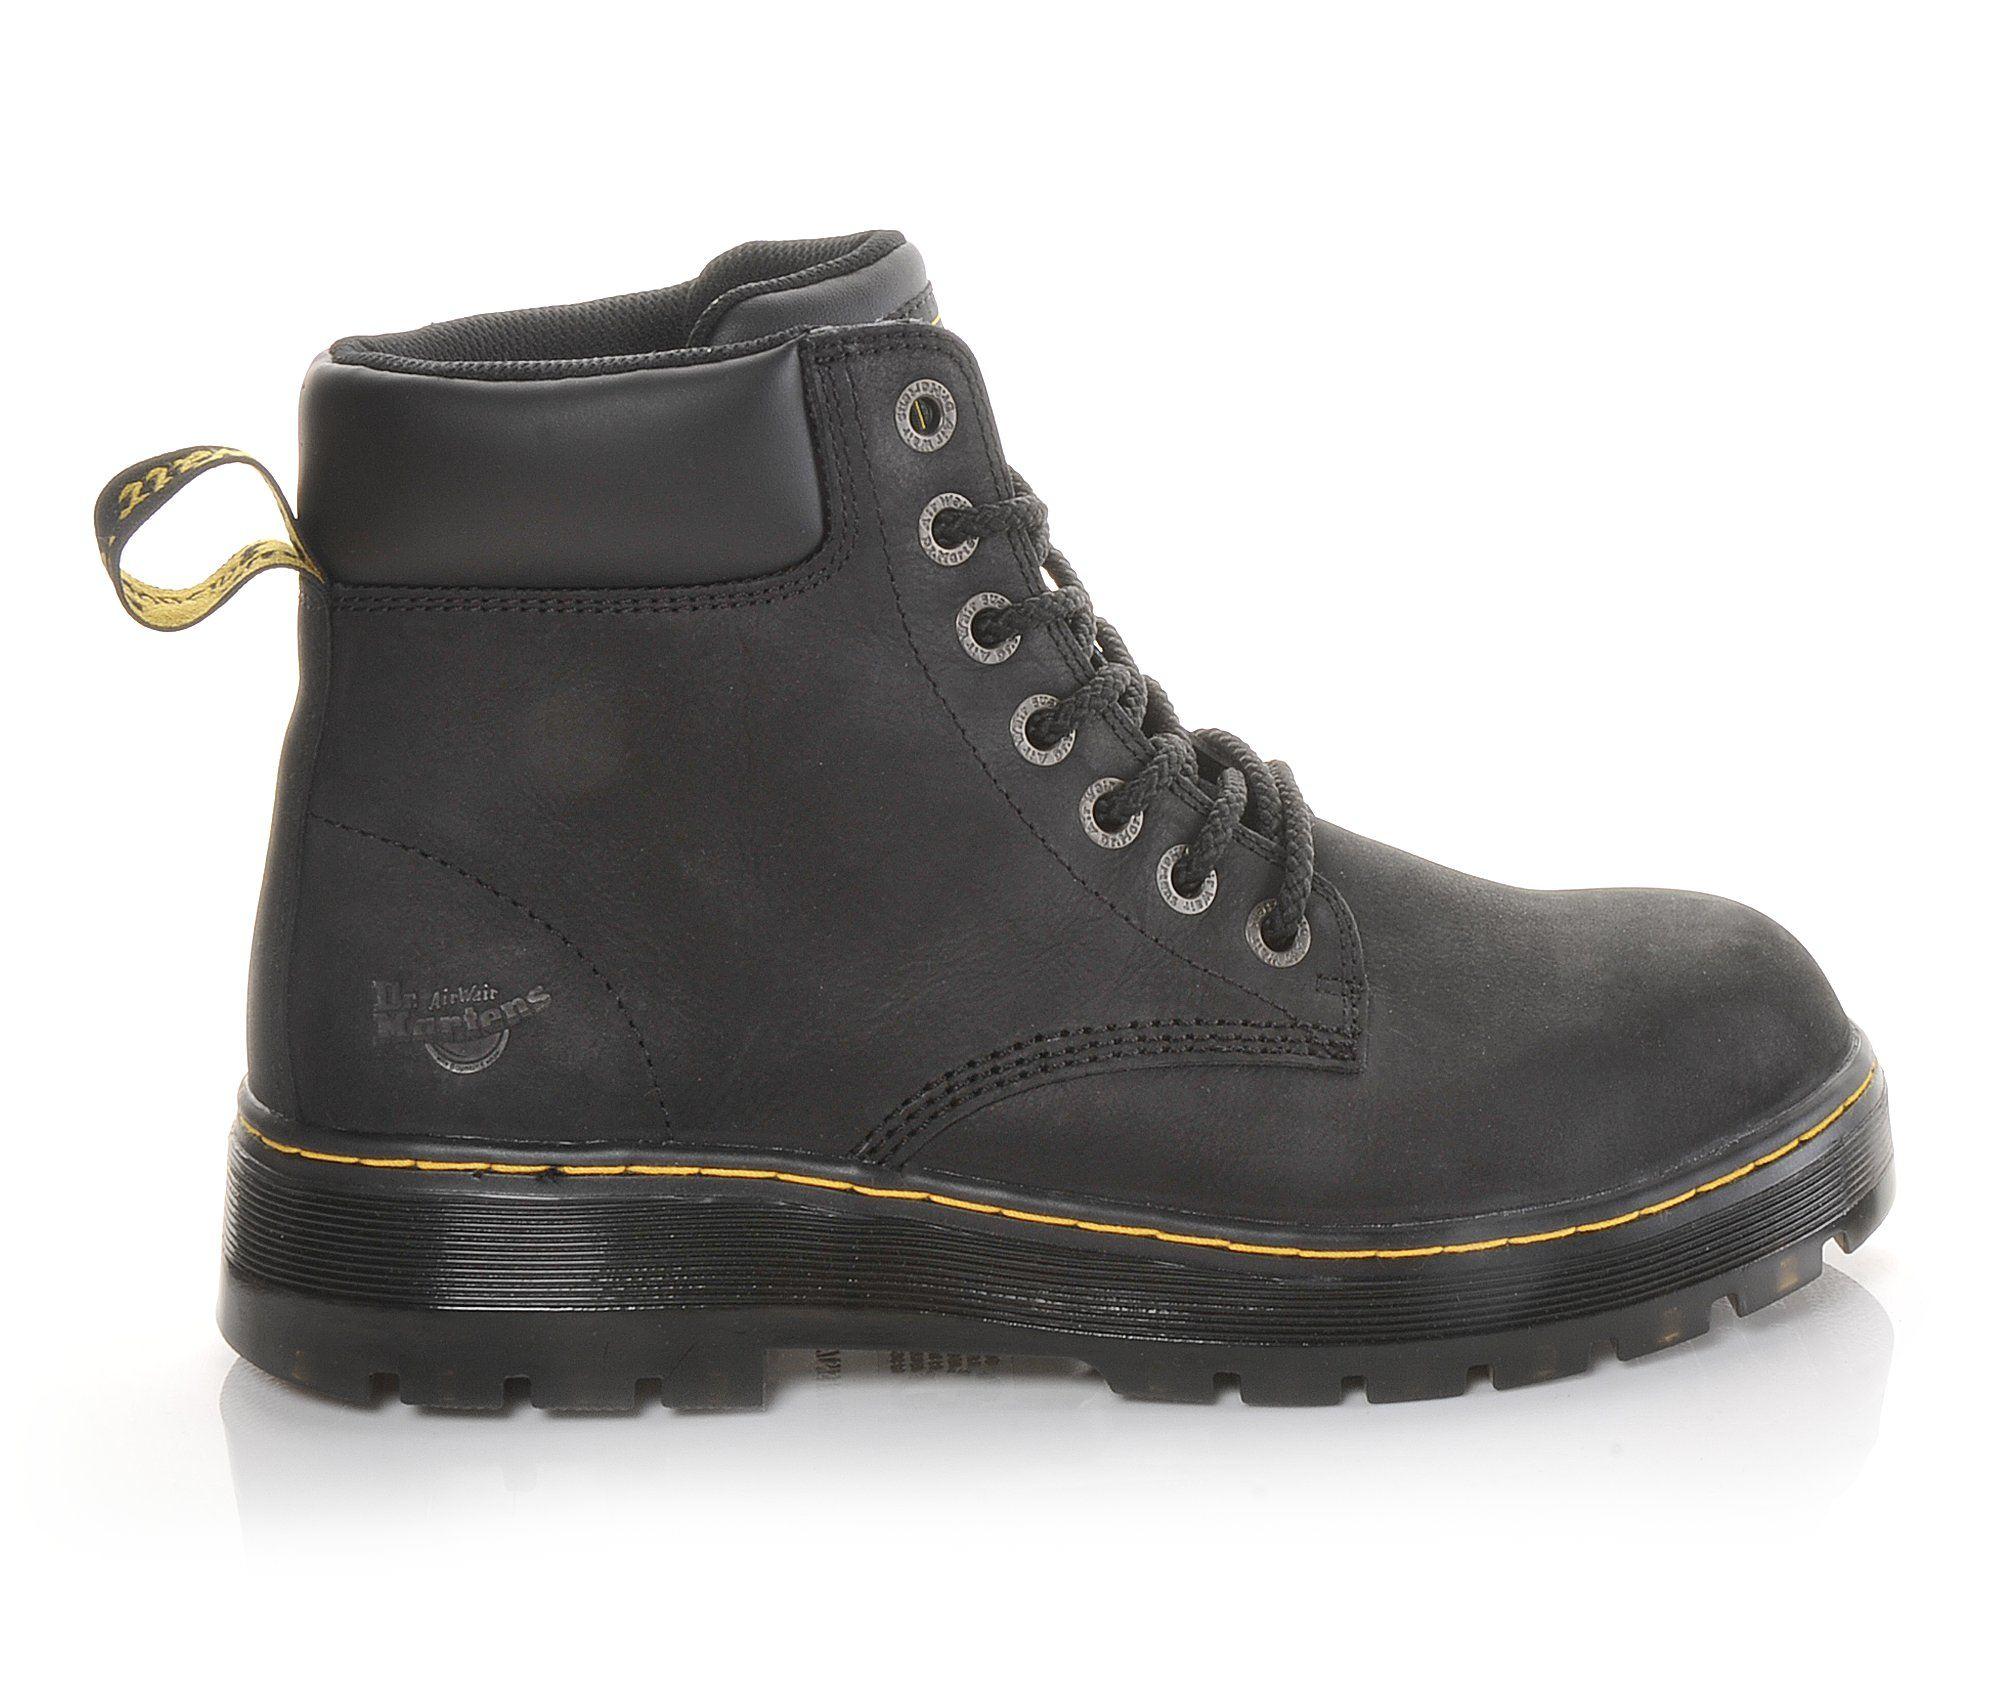 Dr. Martens Industrial Winch Steel Toe Men's Boots (Black Leather)